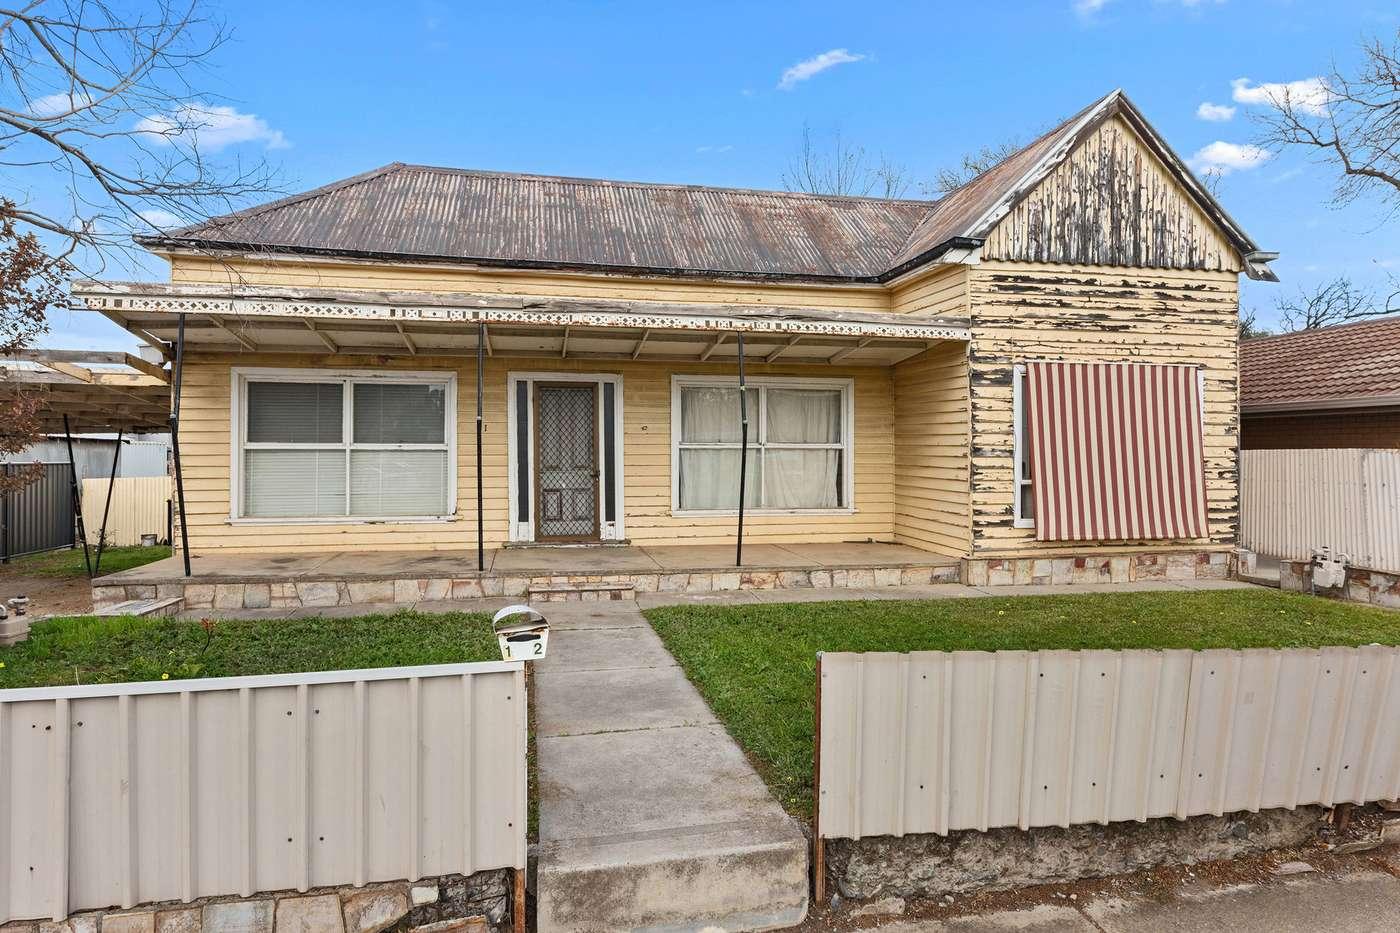 Main view of Homely house listing, 42 Bridge Street, Bendigo, VIC 3550